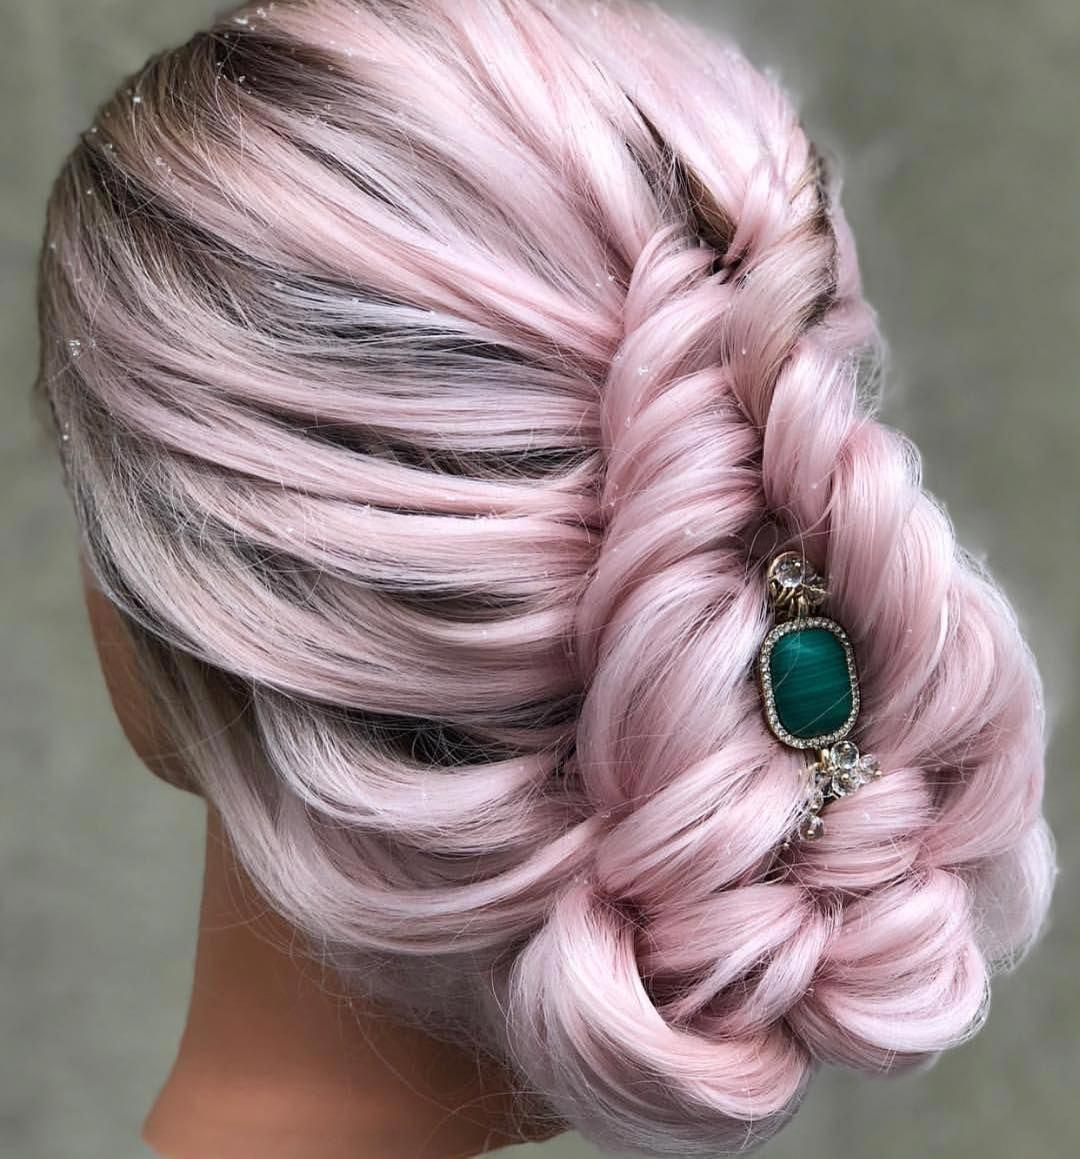 XXL Waves Hair Style hairstyles, hairstyles for medium length hair